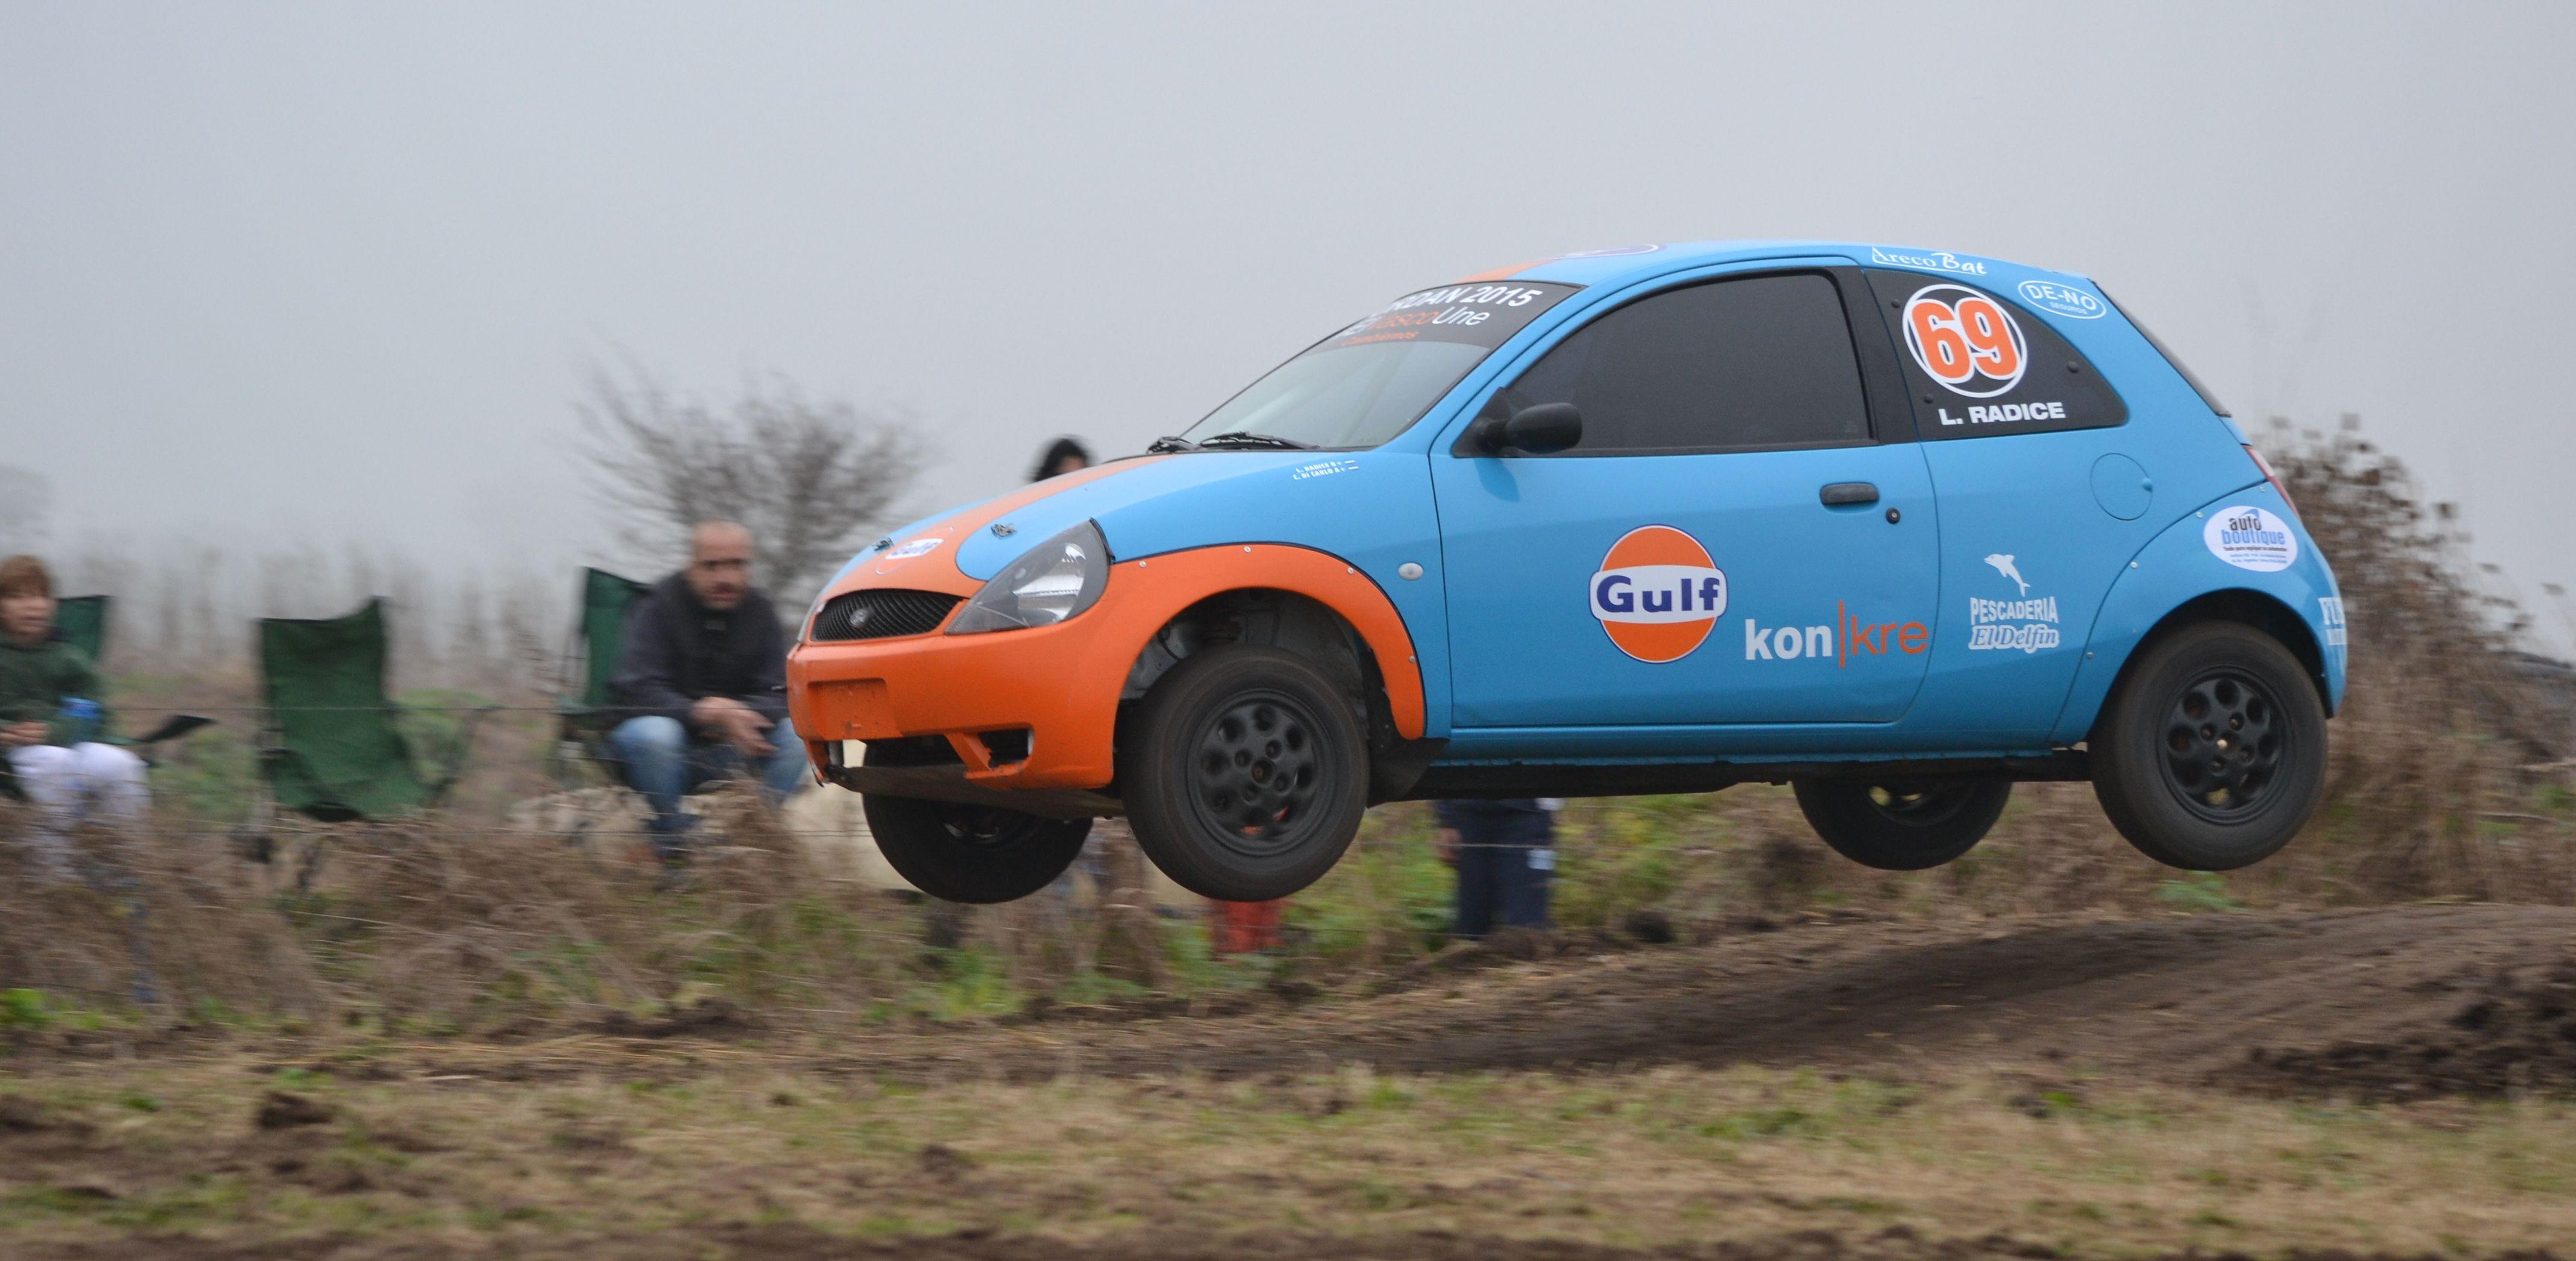 Rally federal 4º fecha - Pergamino - Ford Ka - piloto Lucas Radice & Rally federal 4º fecha - Pergamino - Ford Ka - piloto: Lucas ... markmcfarlin.com